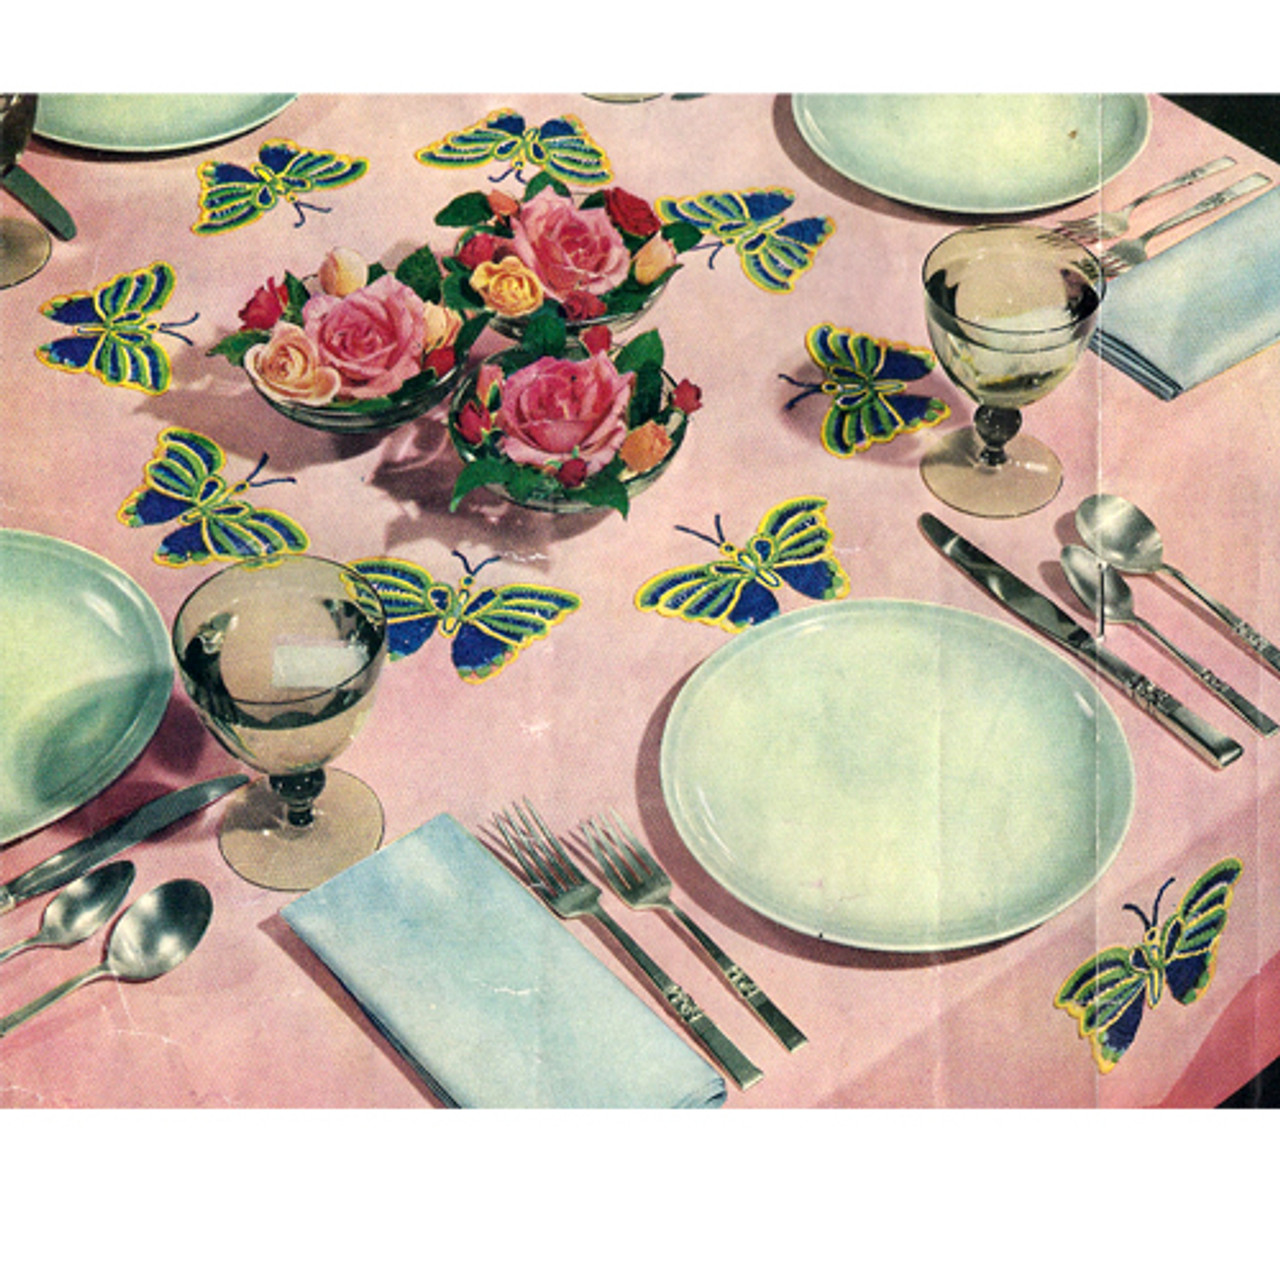 Crochet Butterfly Tablecloth pattern